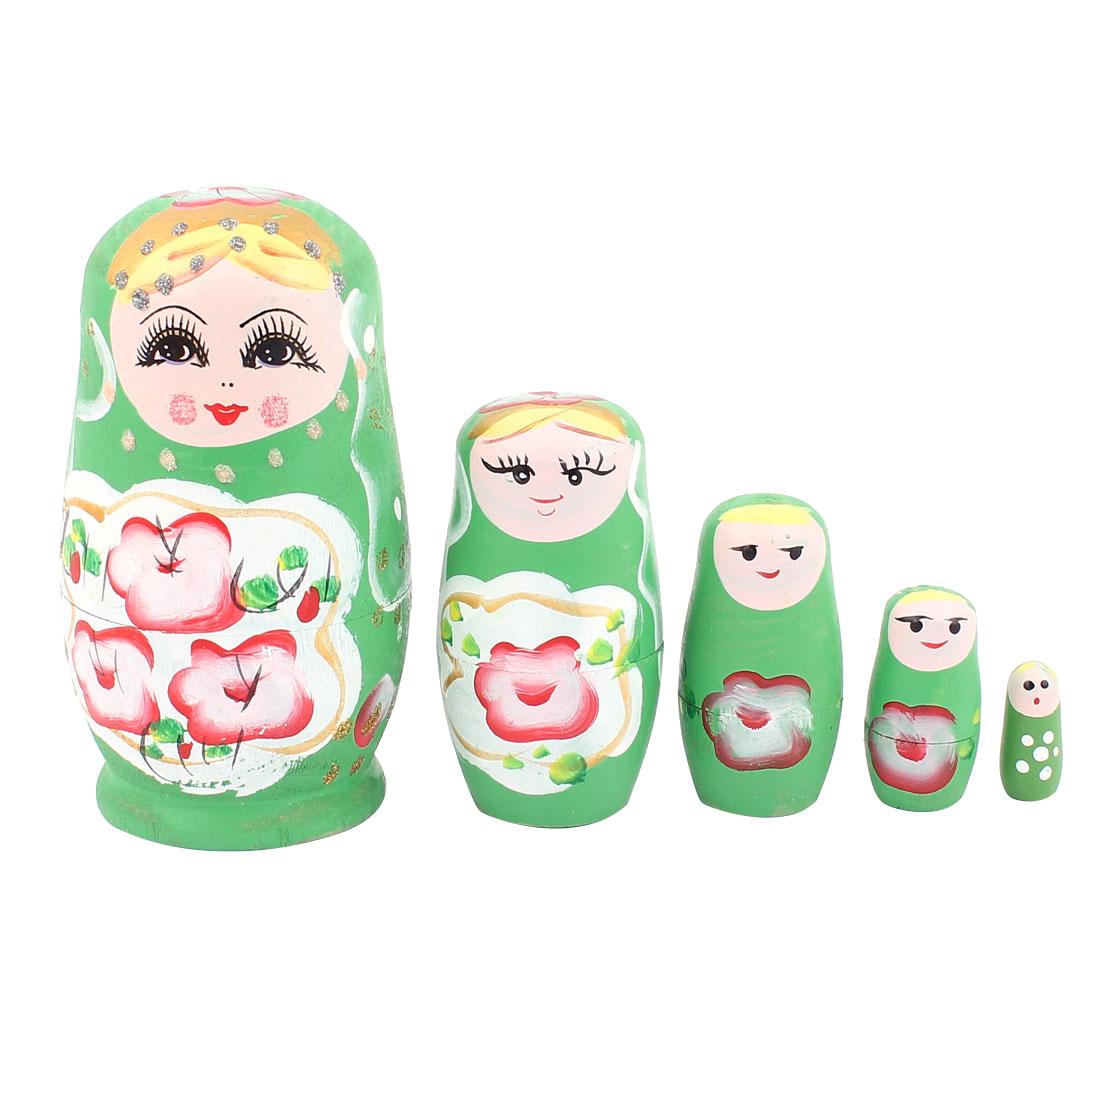 Girl Wooden Flower Pattern Russian Babushka Nesting Matryoshka Doll Green 5 in 1